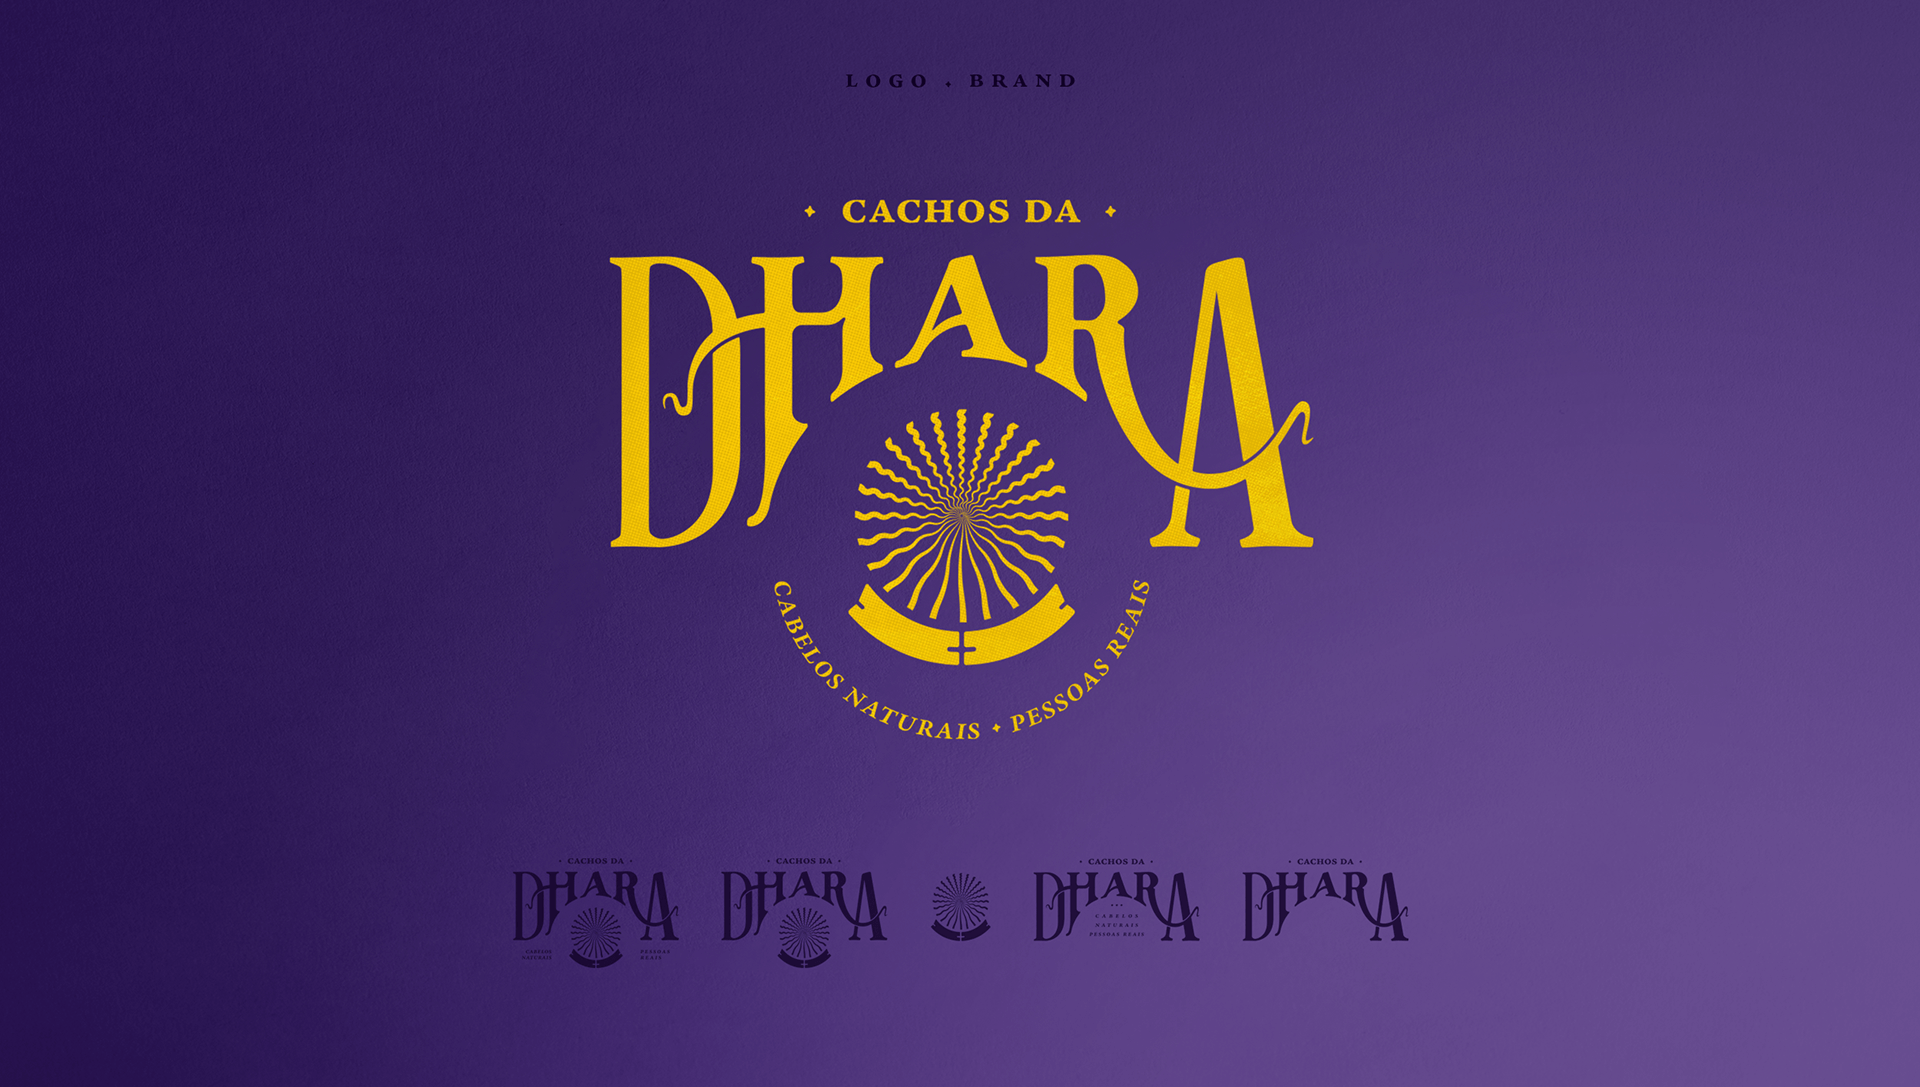 cachos-da-dhara-hugger-studio-03